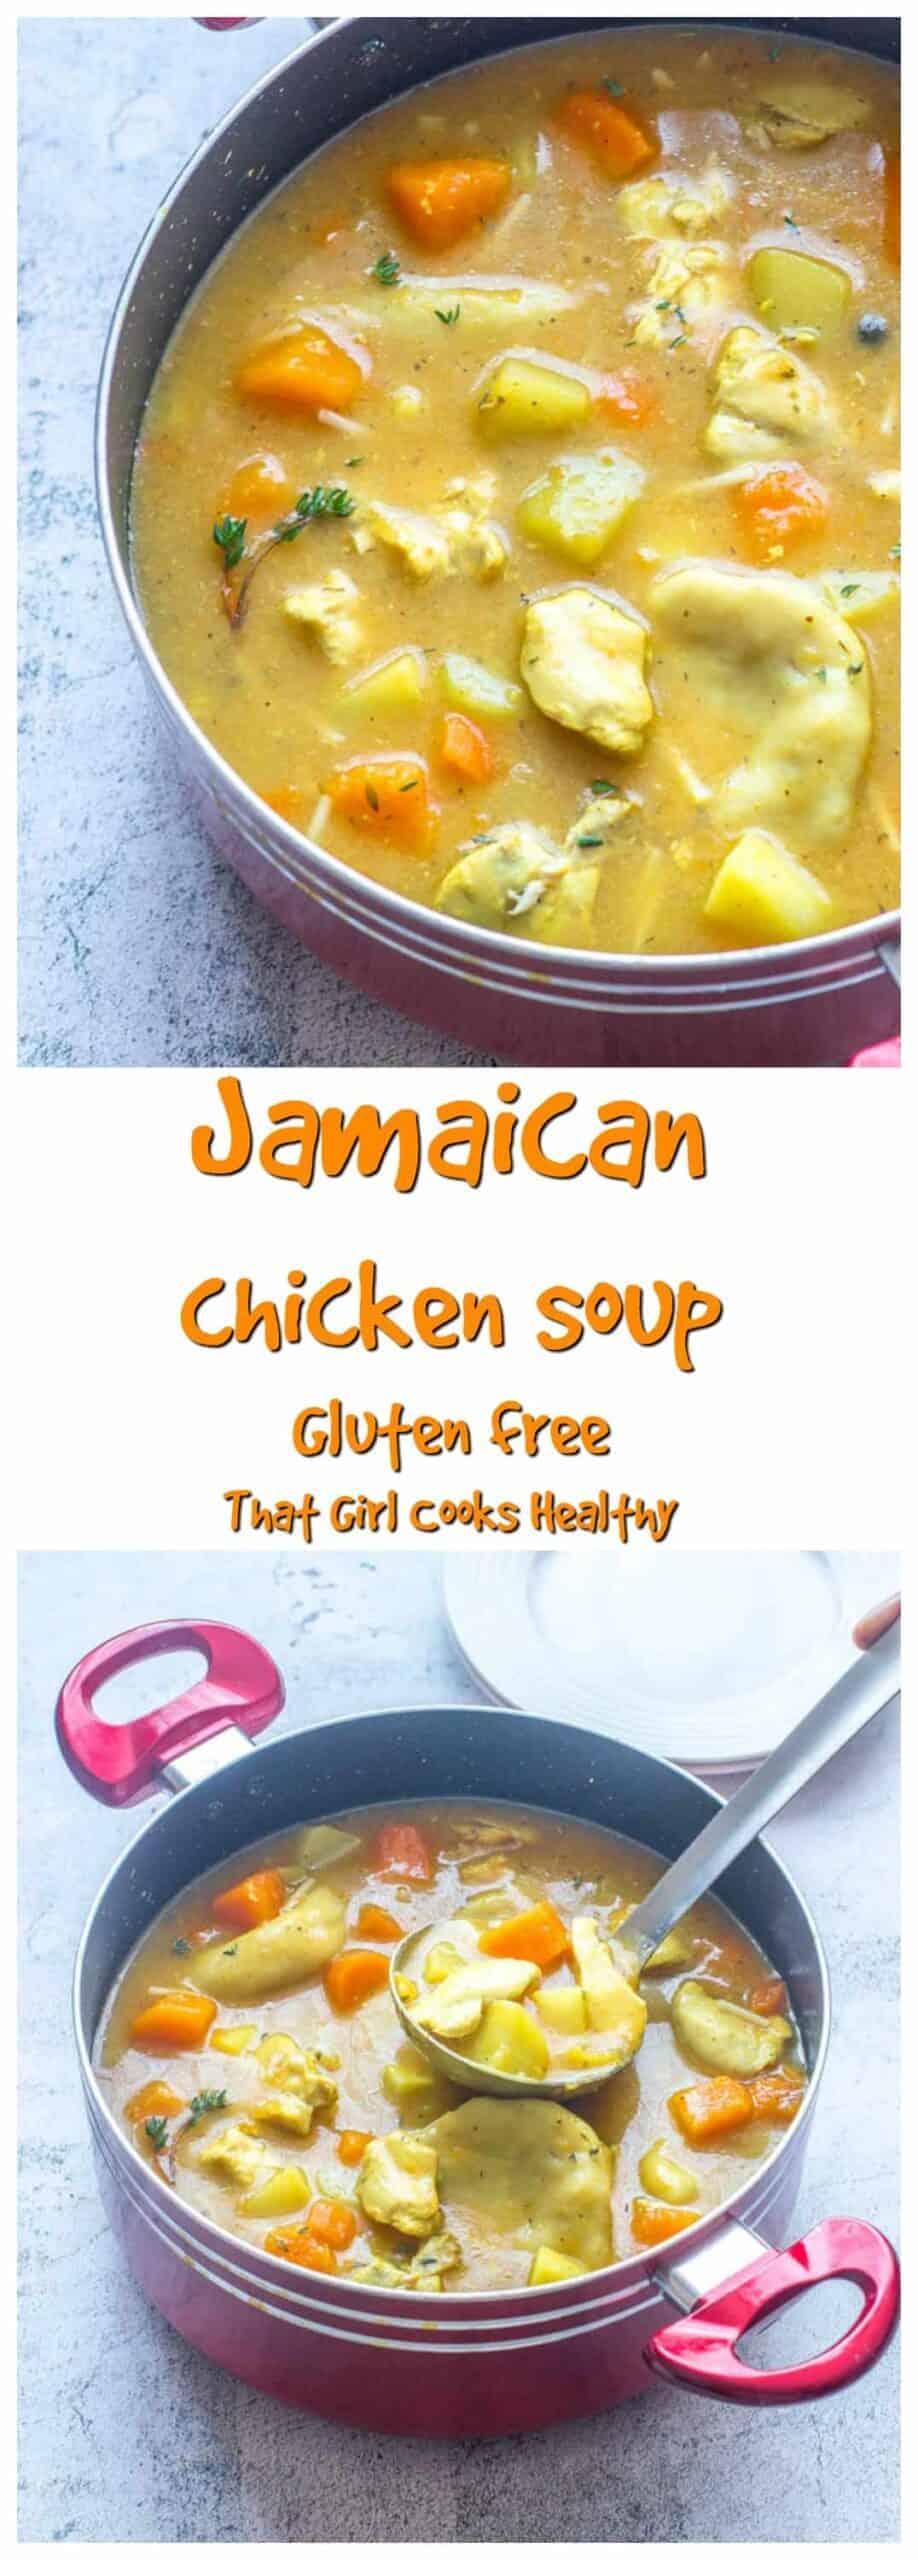 jamaican chicken soup gluten free  that girl cooks healthy